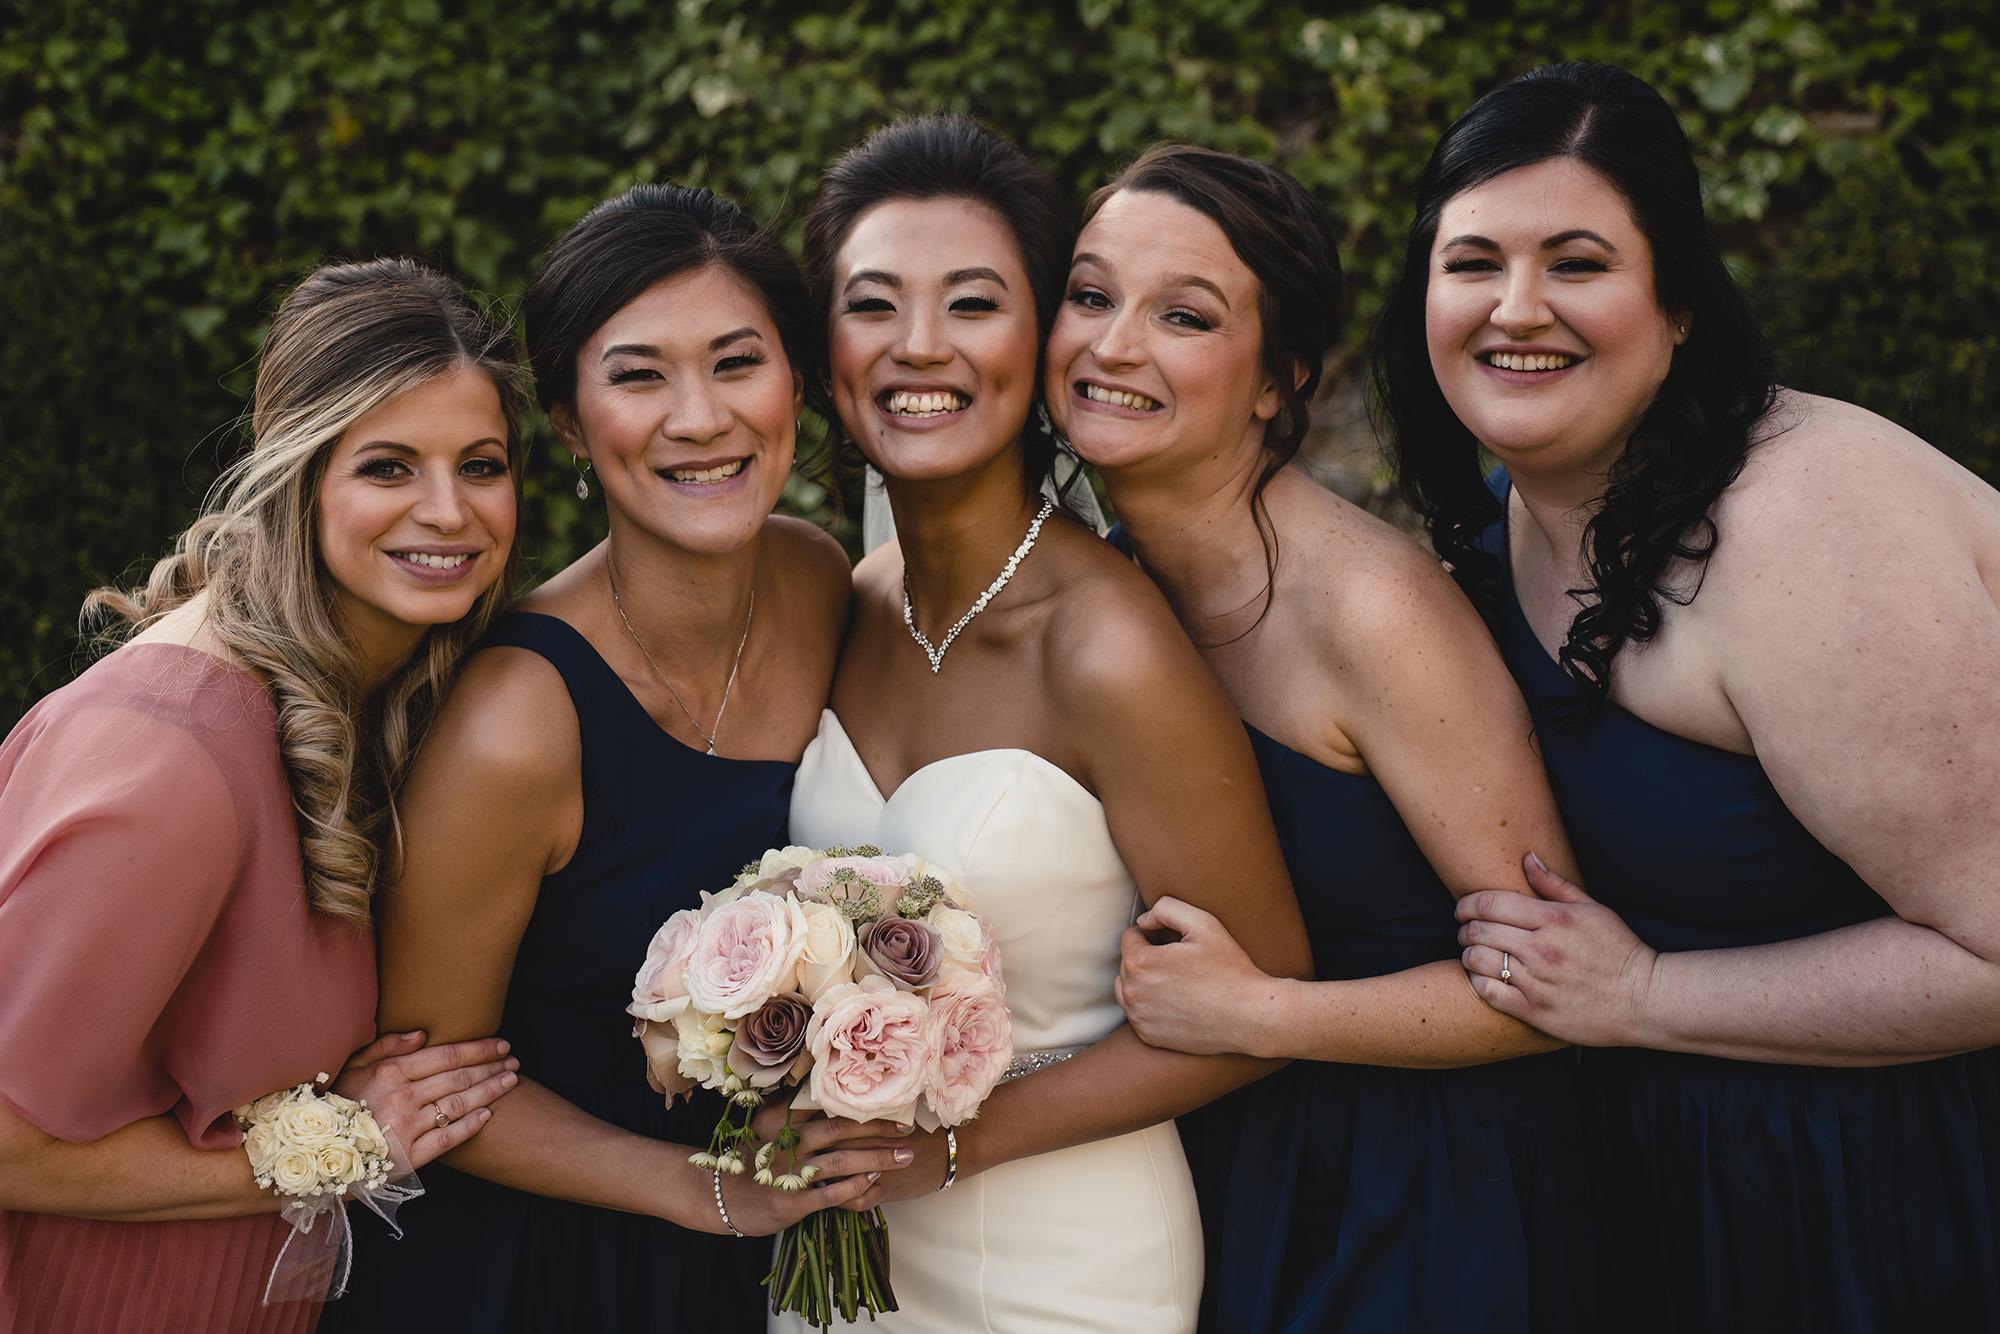 bride and her bridesmaids wedding portrait